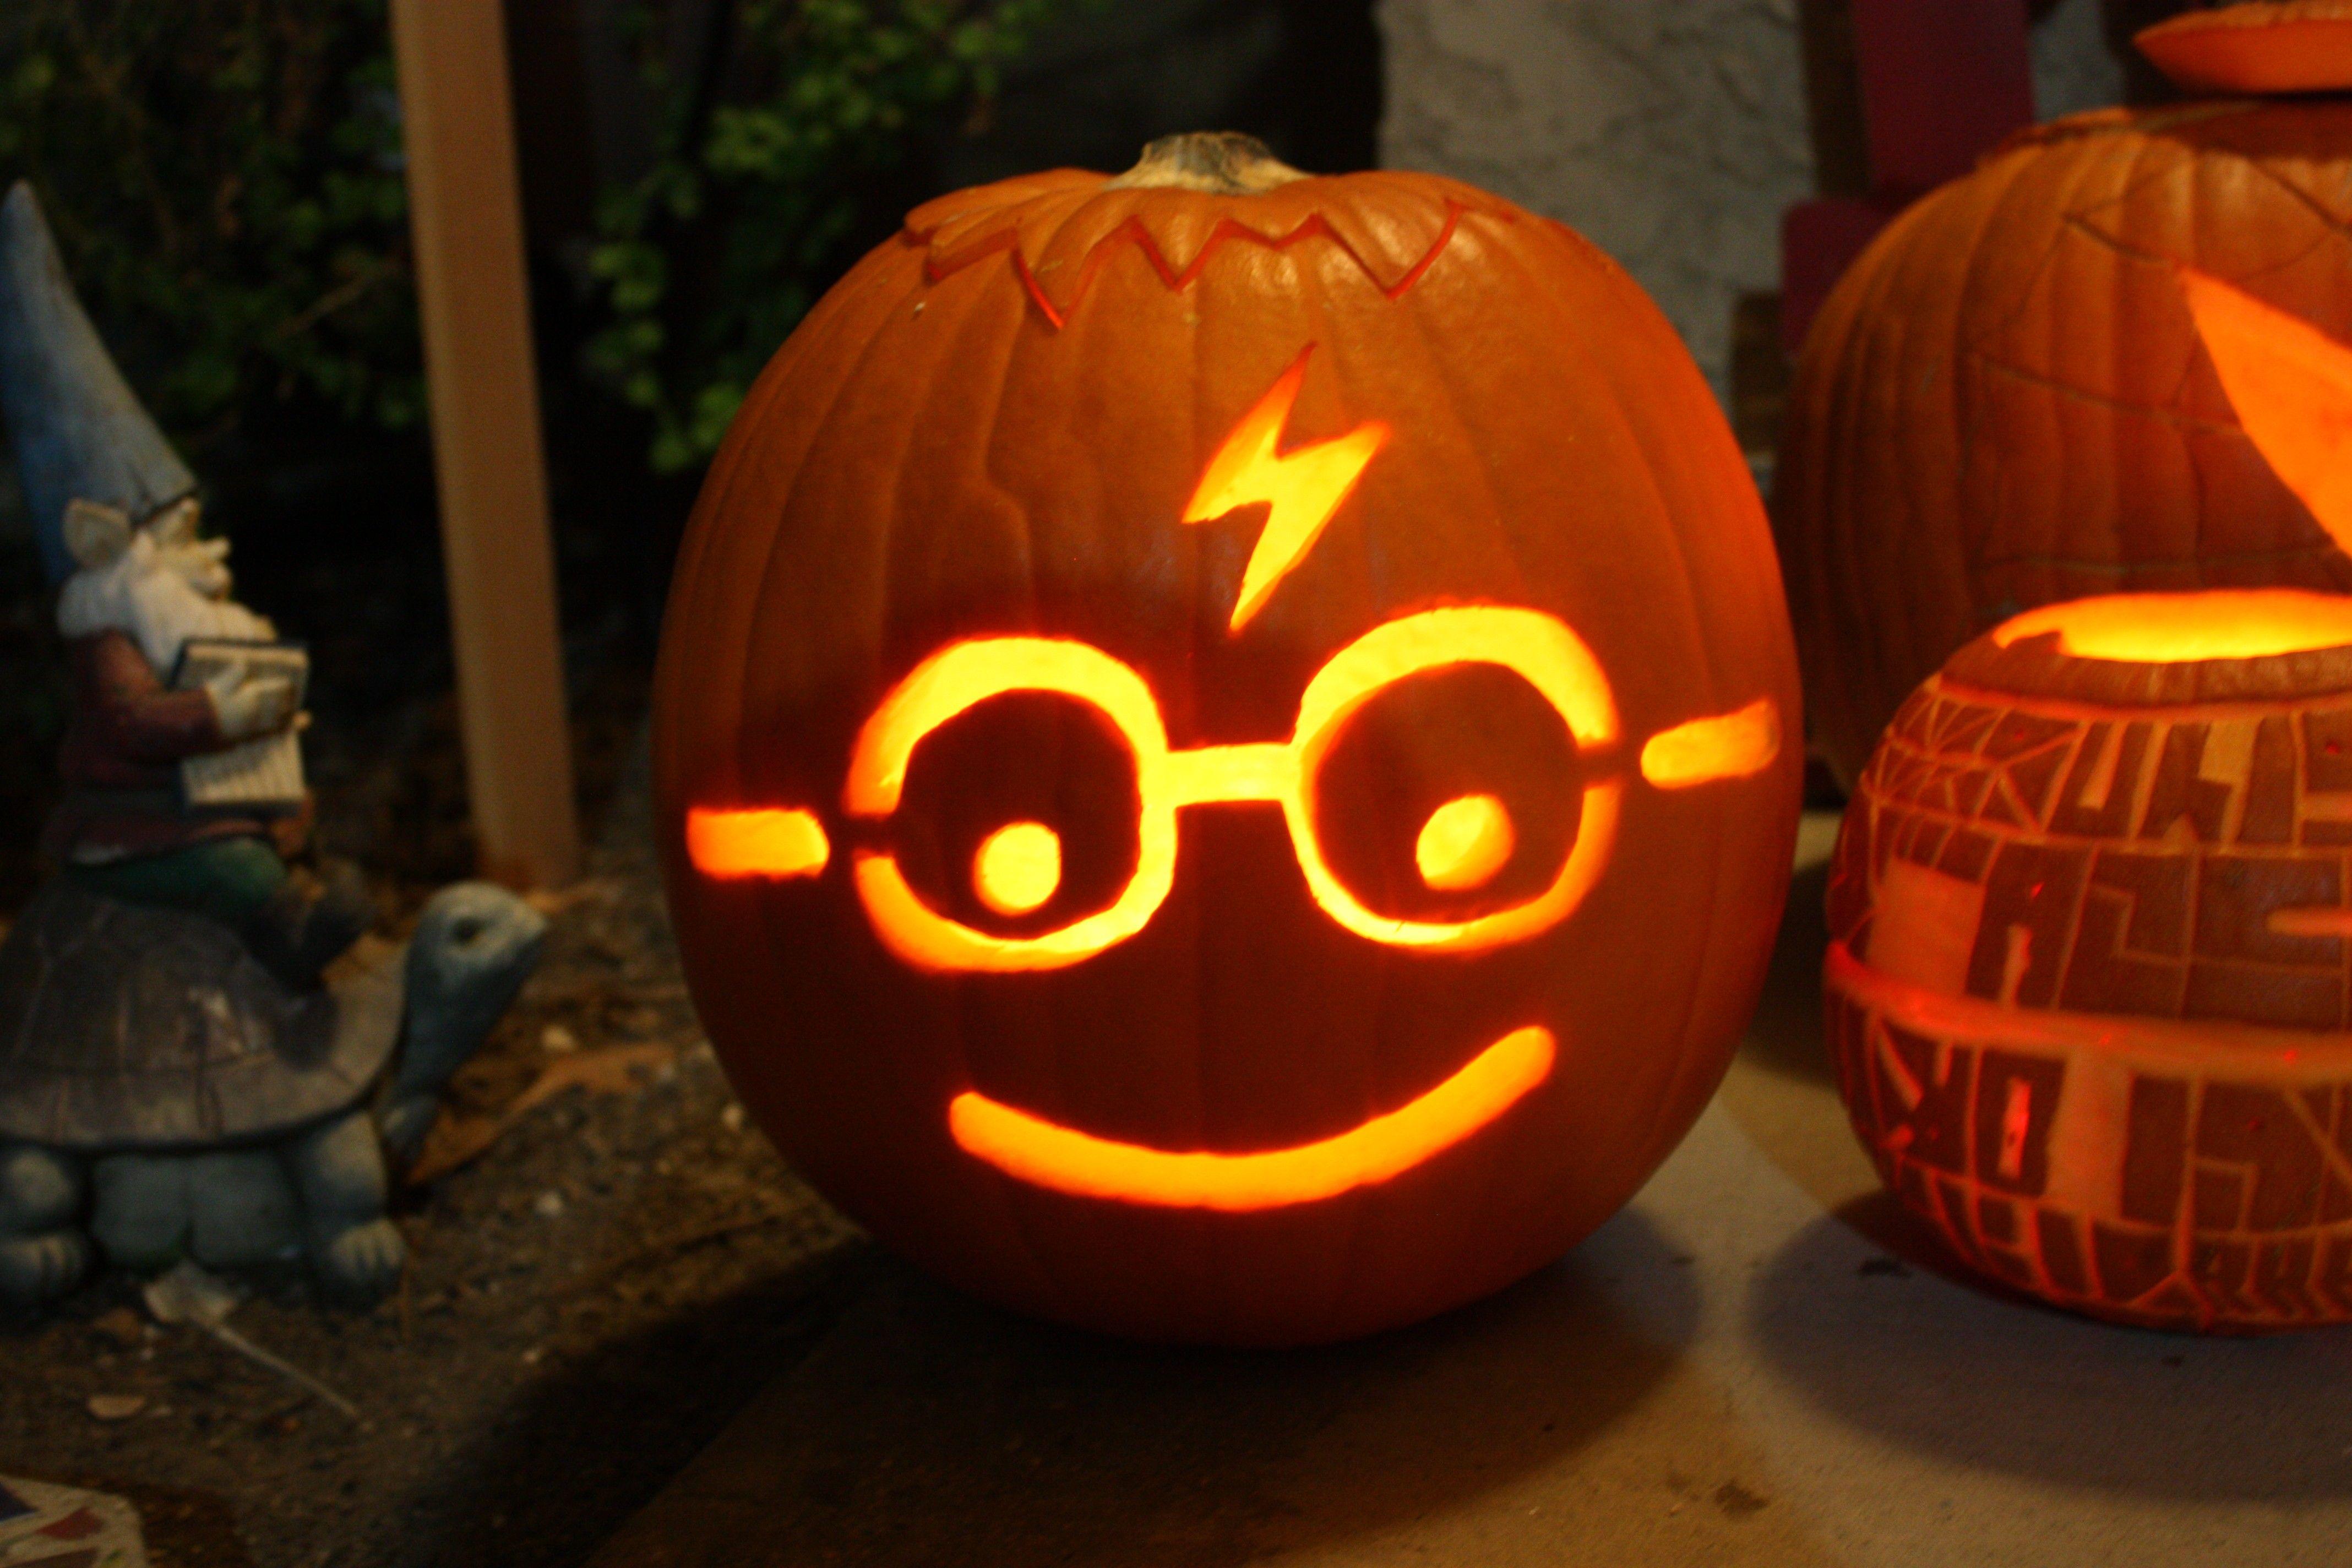 Harry Potter Pumpkin Carvings Minion Jack O Lantern Stencil Pumpkin Carving Harry Potter Pumpkin Carving Easy Pumpkin Carving